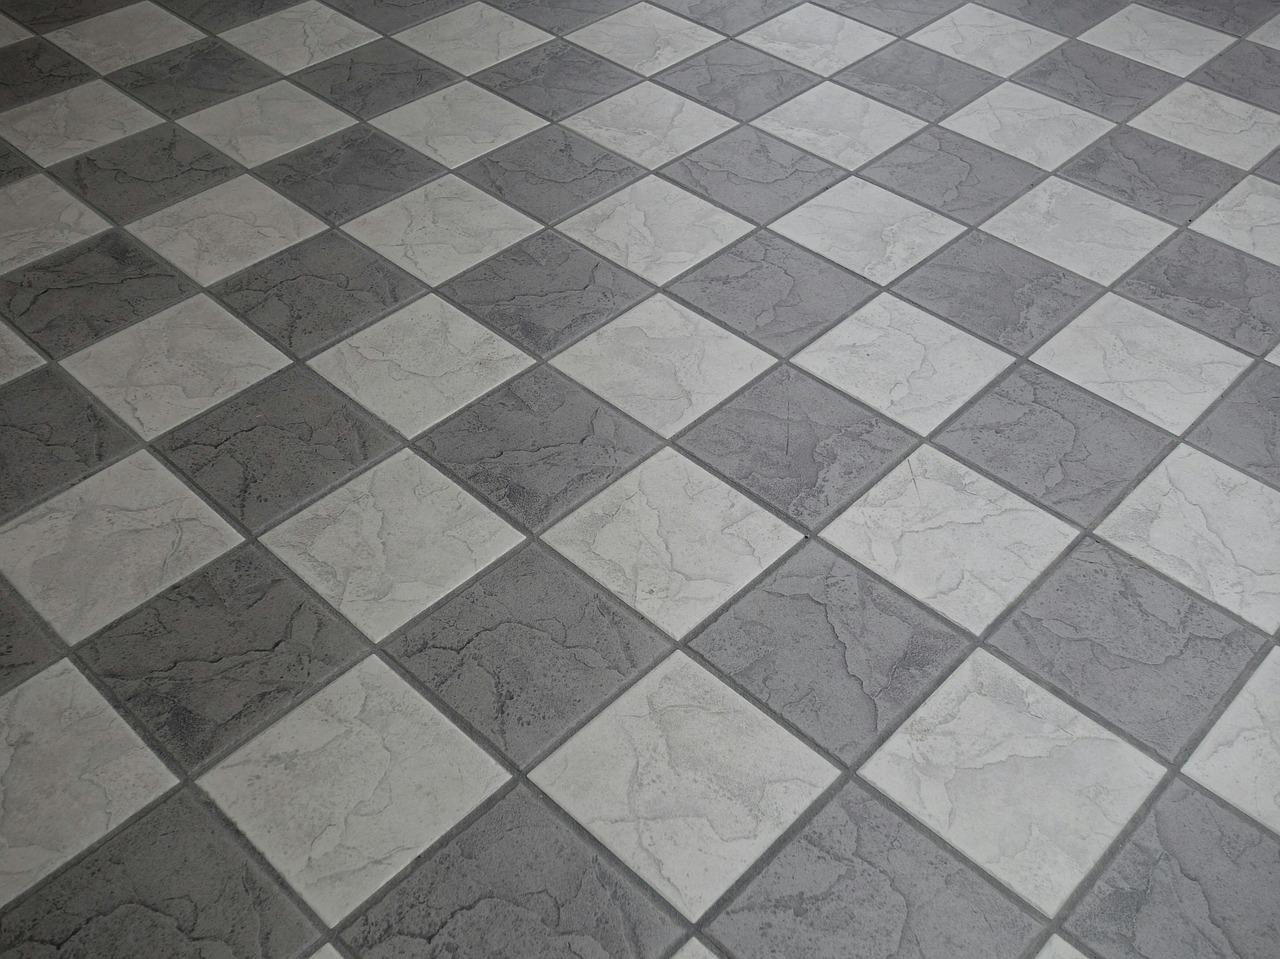 6 Reasons To Install A Porcelain Tile Commercial Floor - Winterior Decor Blog